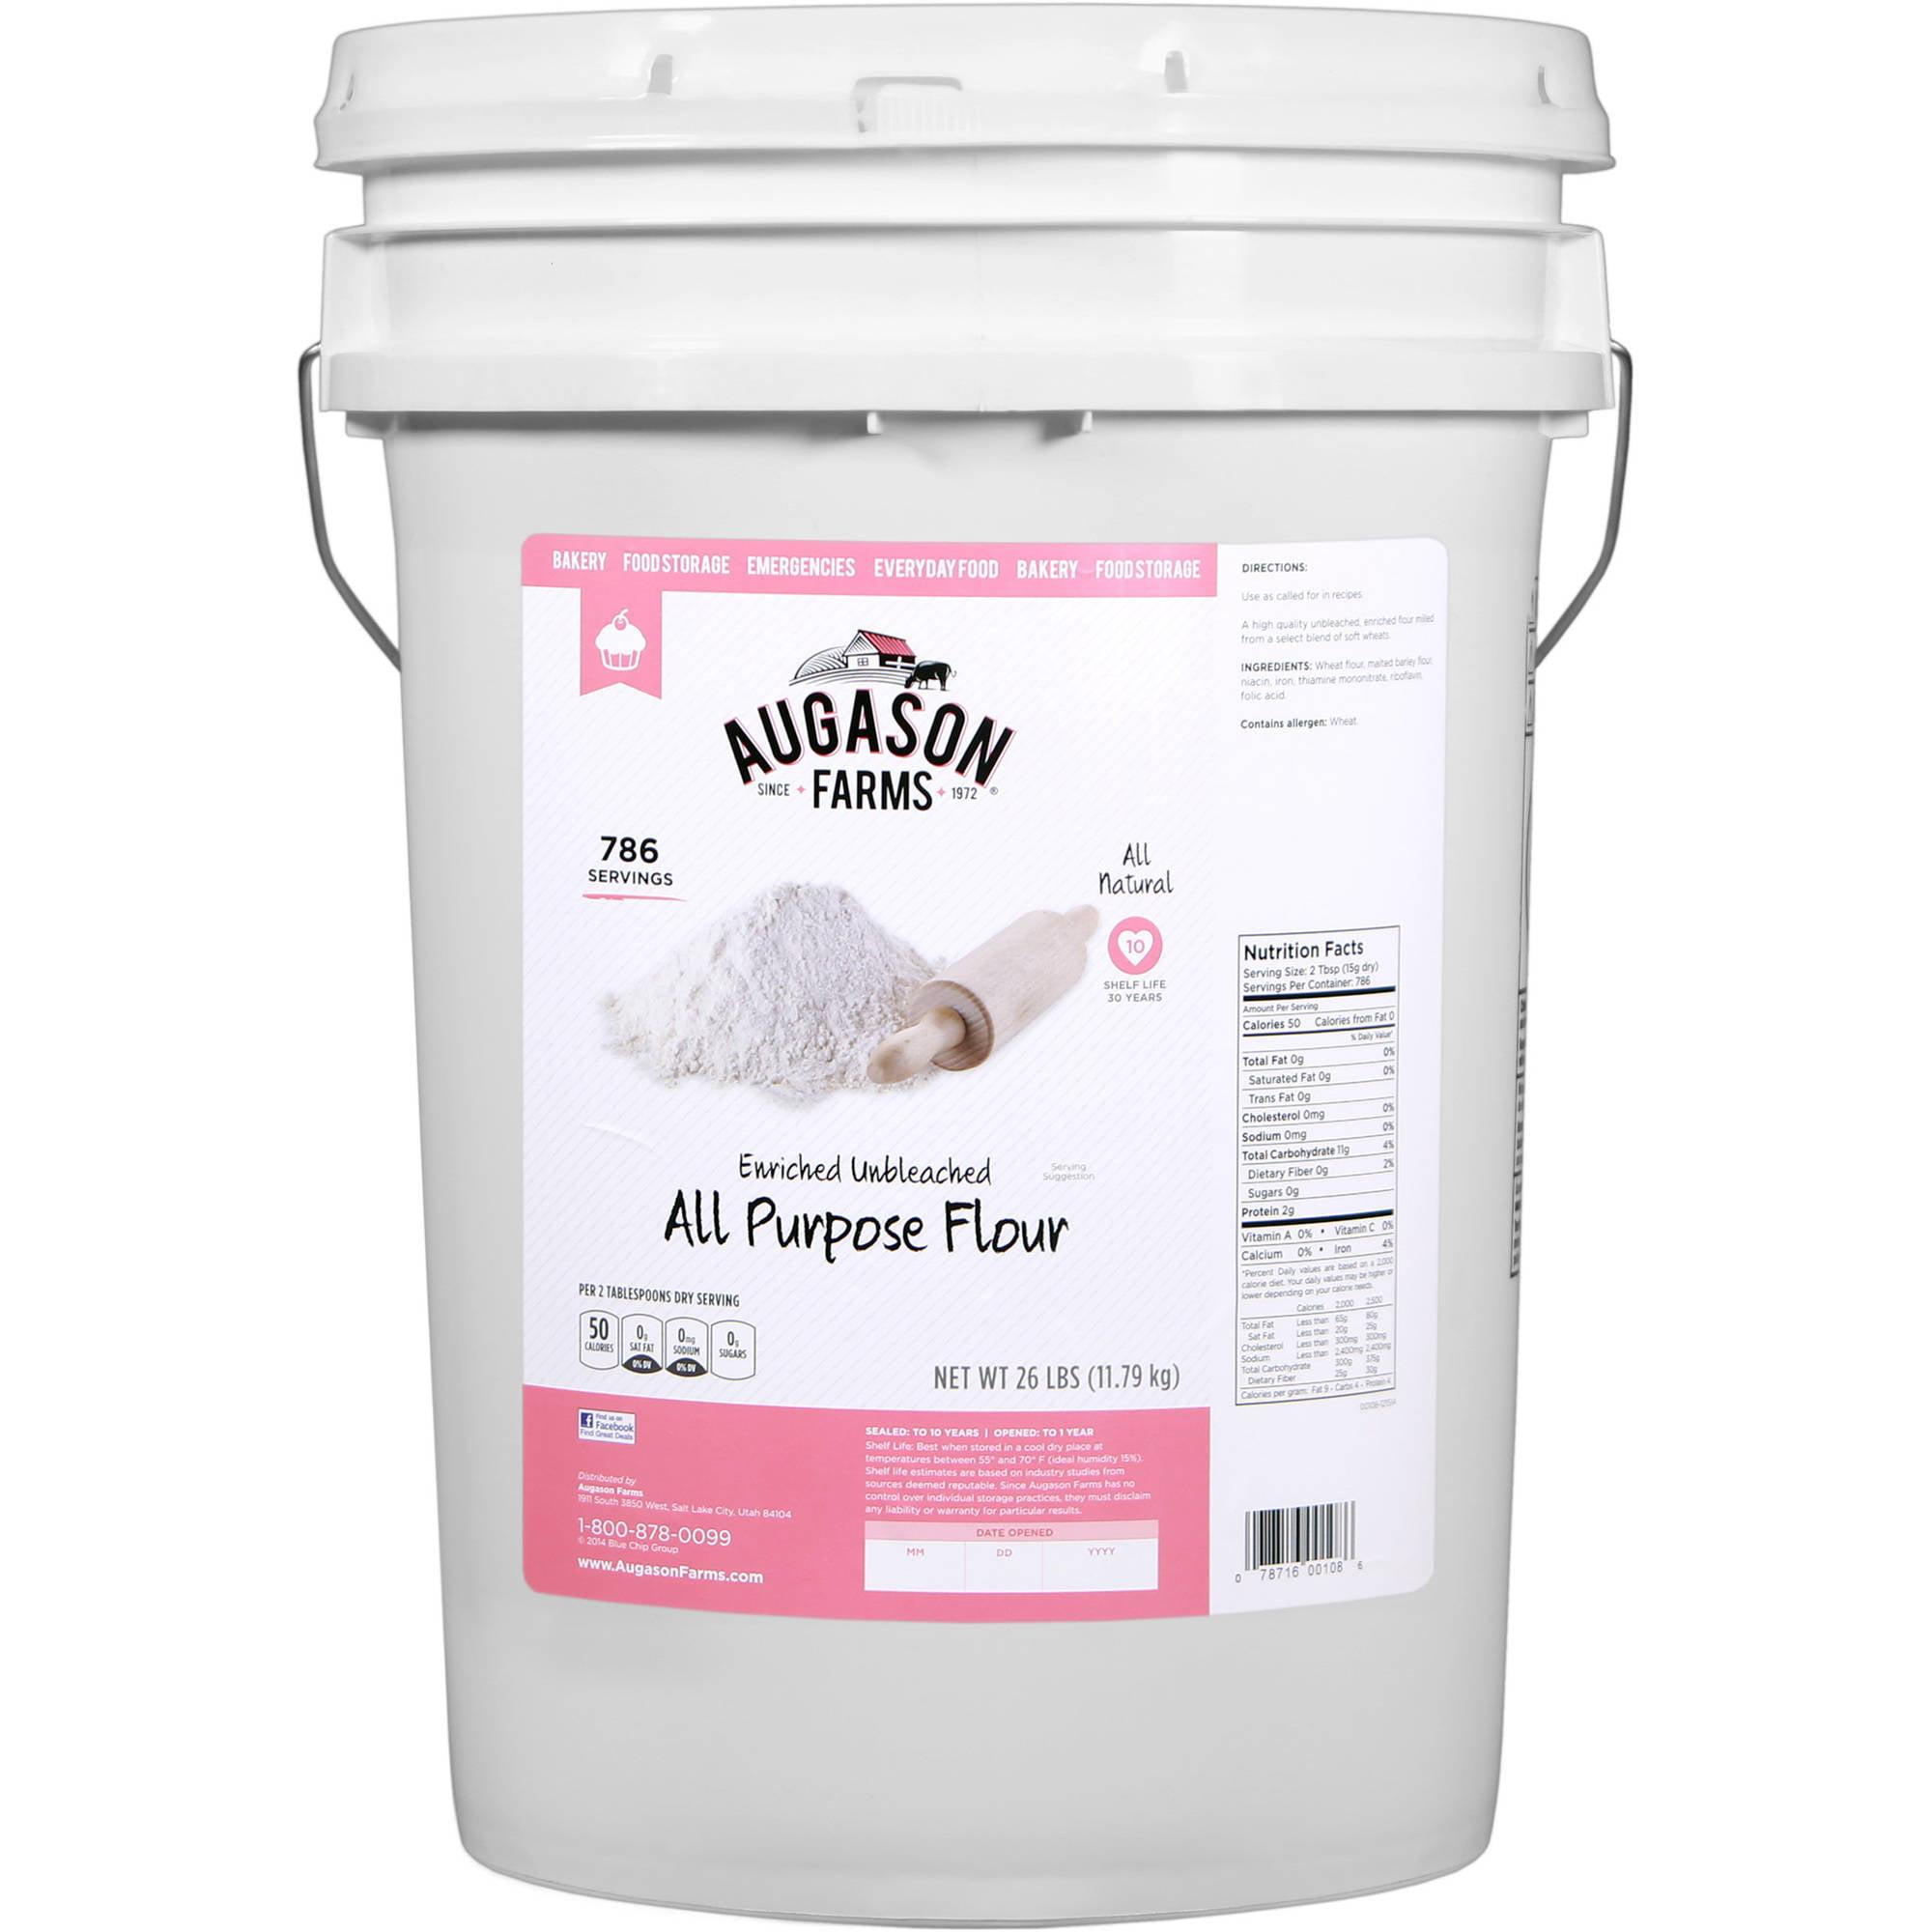 Augason Farms Enriched Unbleached All Purpose Flour, 35 lbs